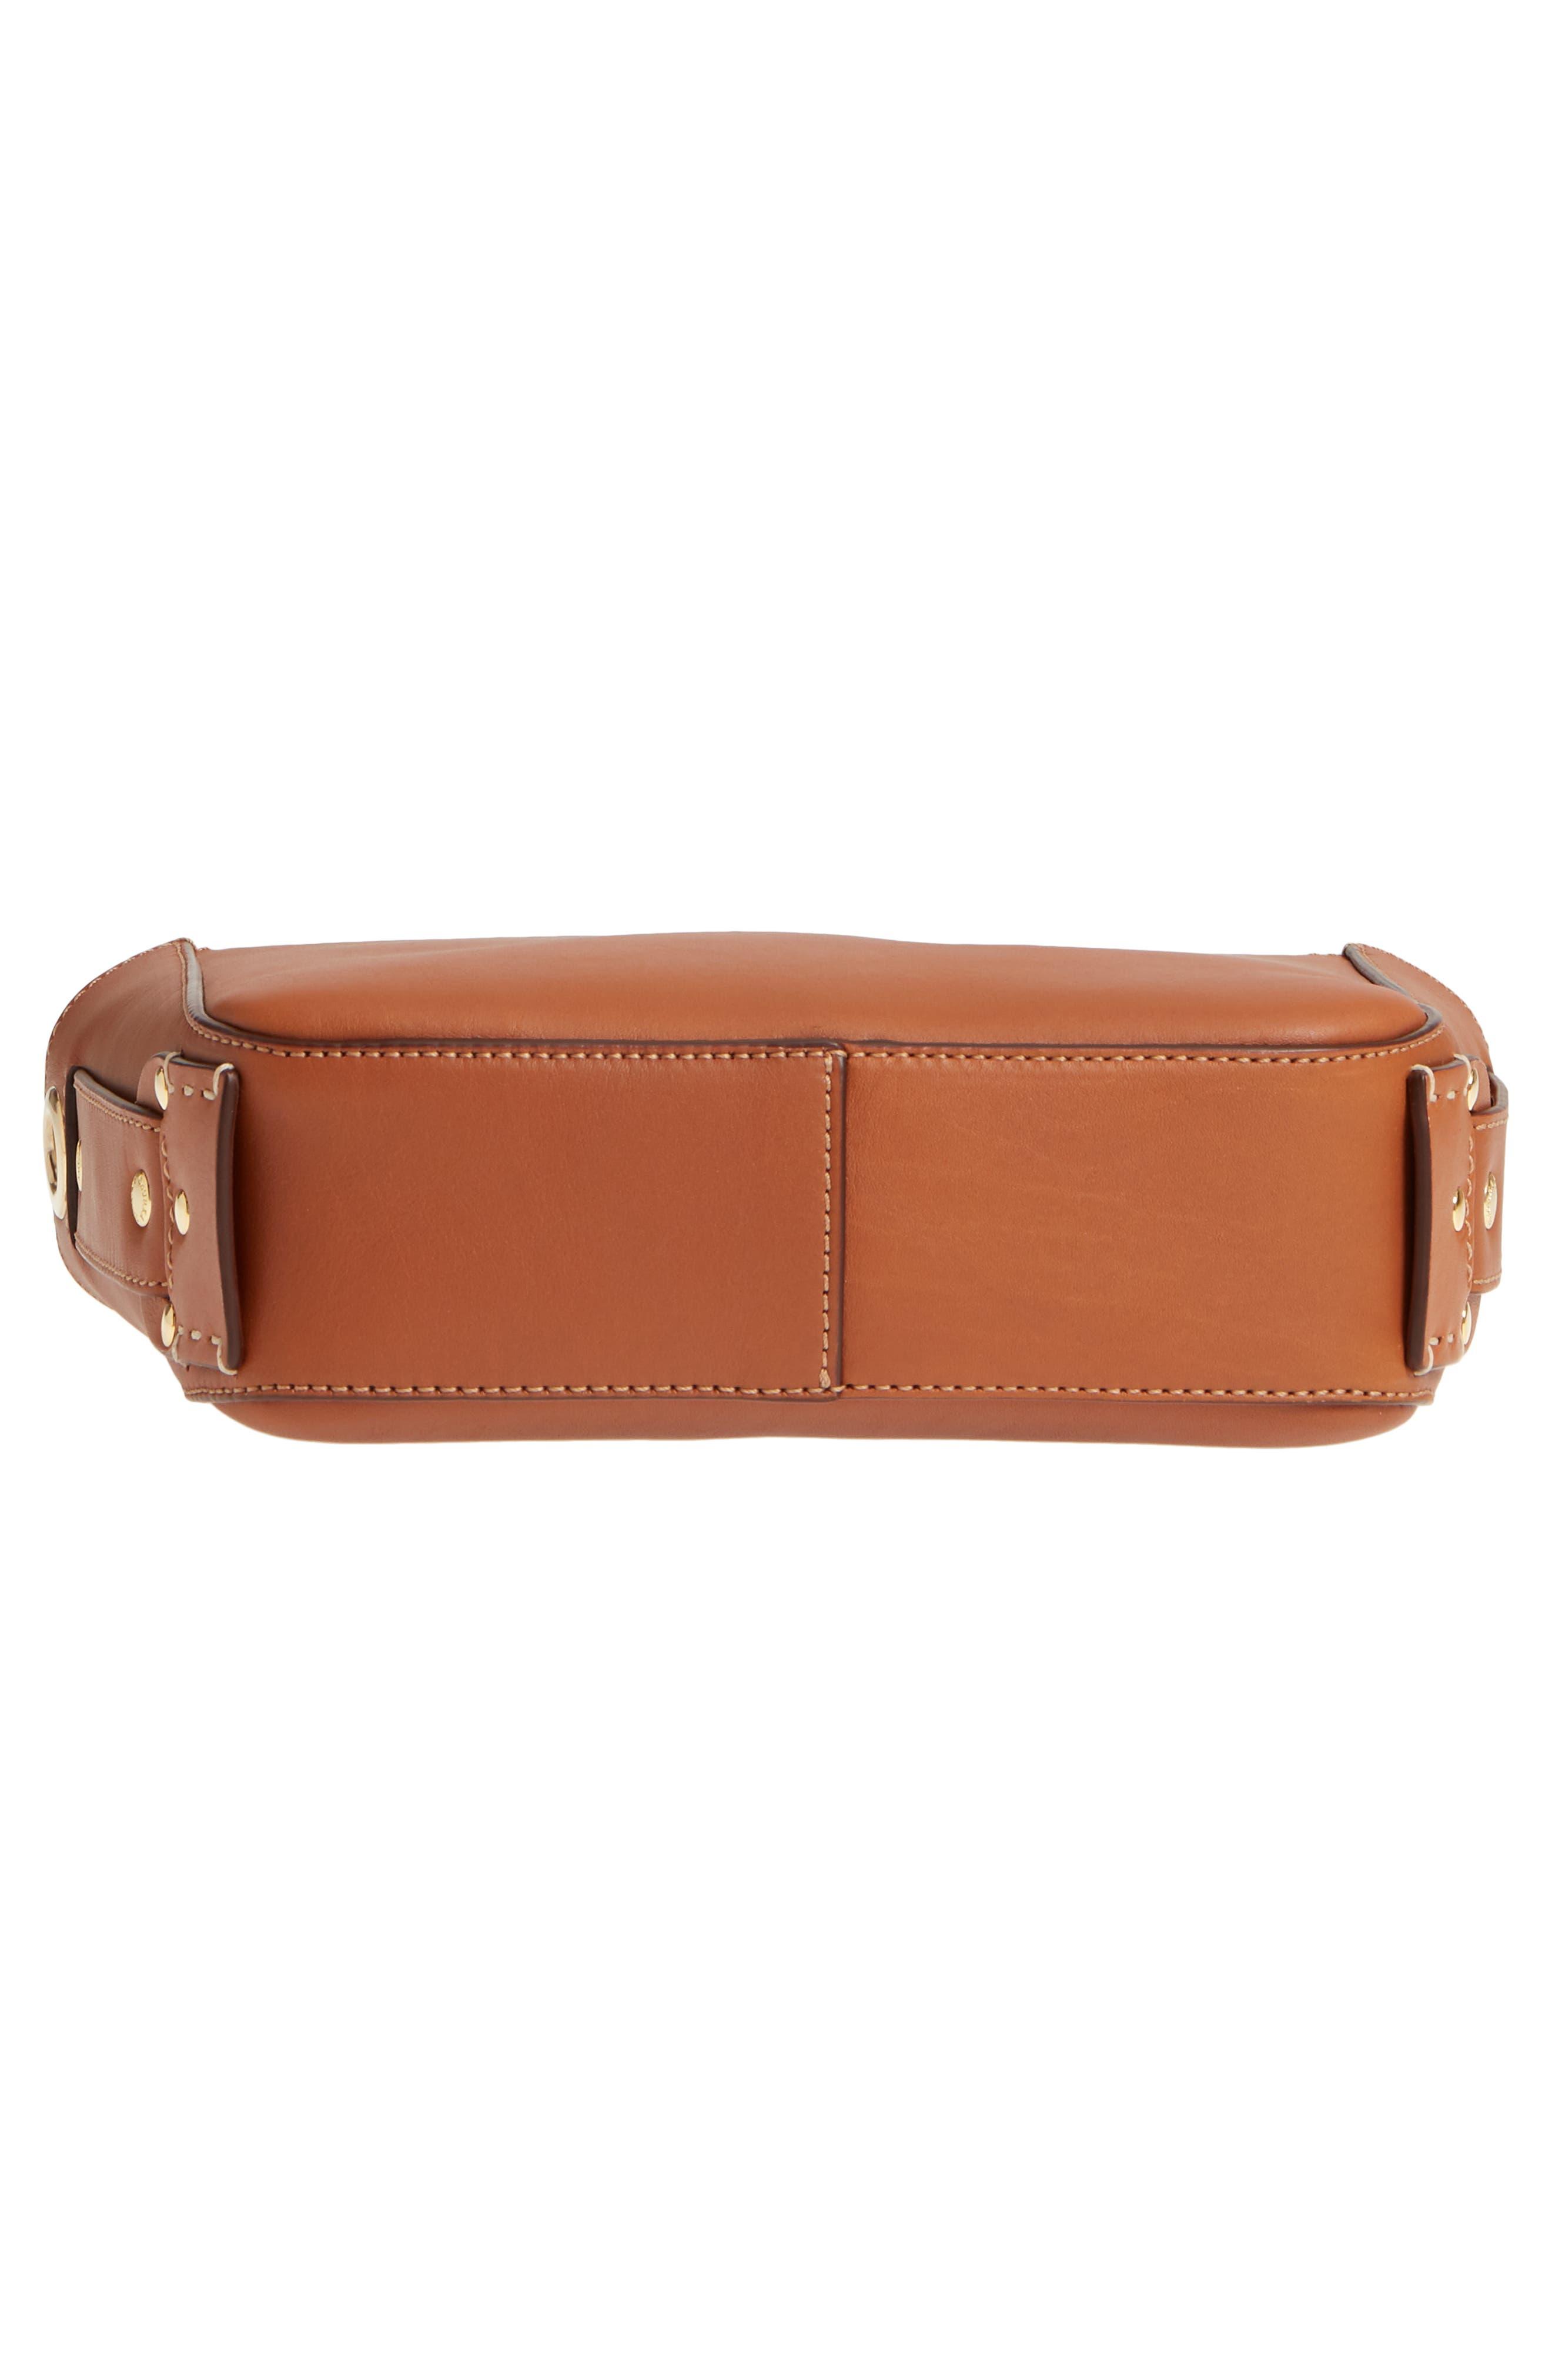 Tilley Leather Crossbody Bag,                             Alternate thumbnail 6, color,                             CHESTNUT